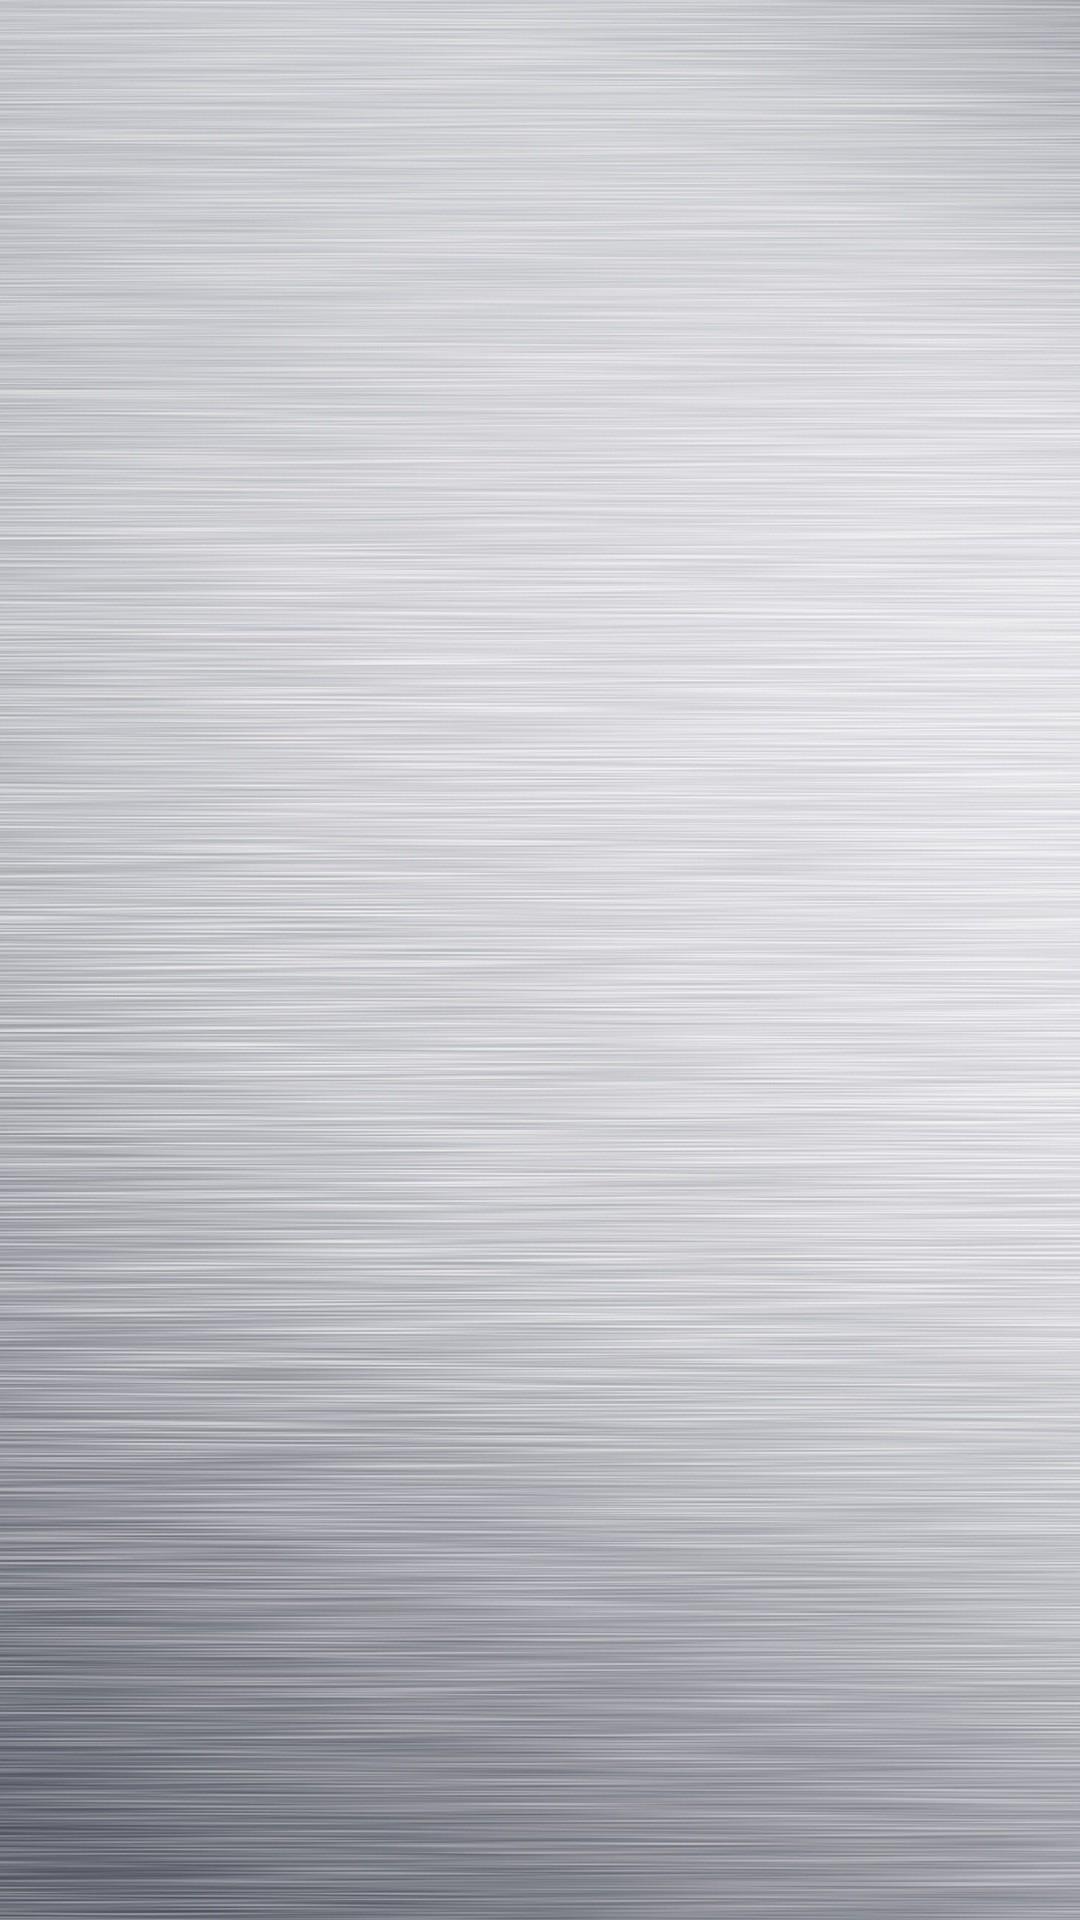 Black Metal Texture HD desktop wallpaper High Definition   HD Wallpapers    Pinterest   Black metal, Wallpaper and Hd desktop